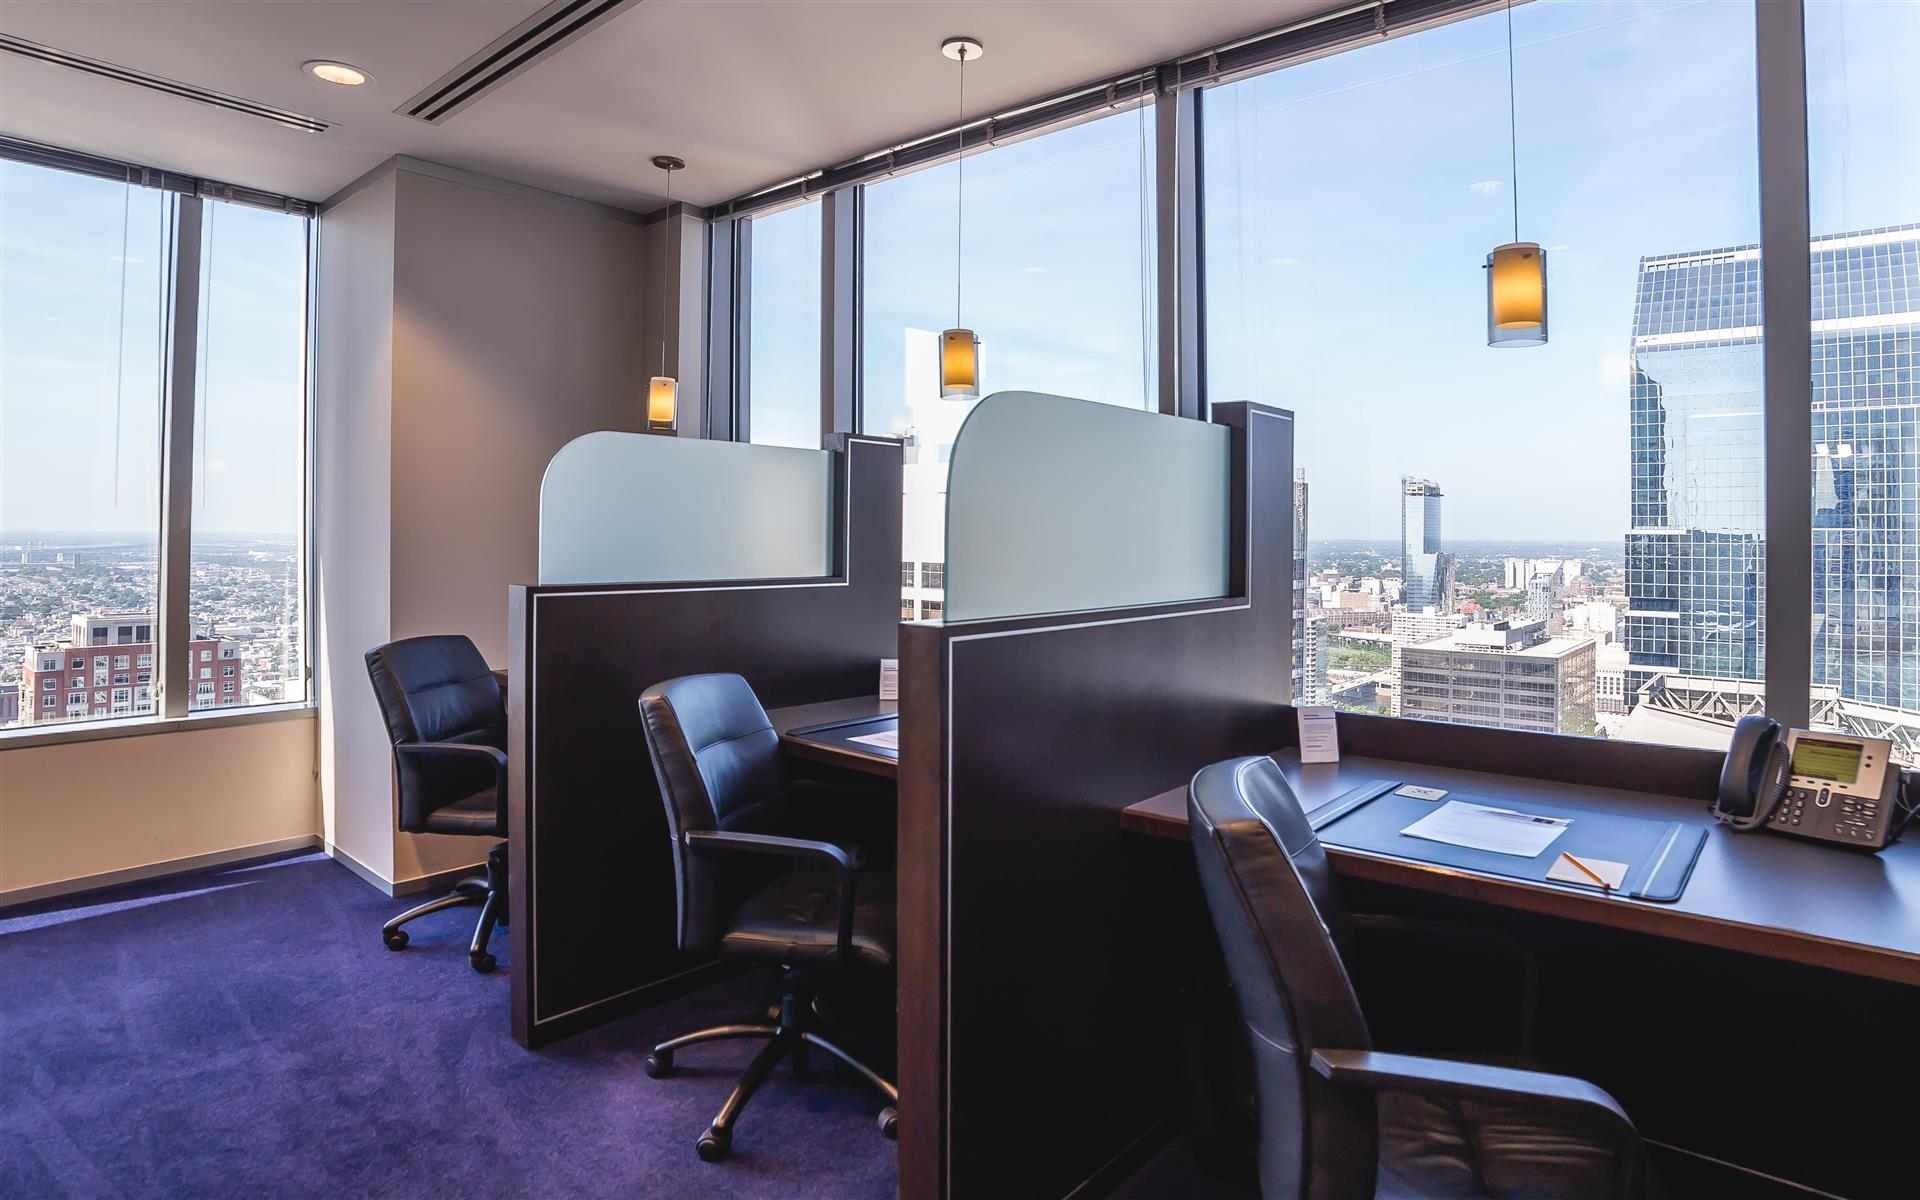 Servcorp - Philadelphia BNY Mellon Center - Coworking Lounge Workstation 4